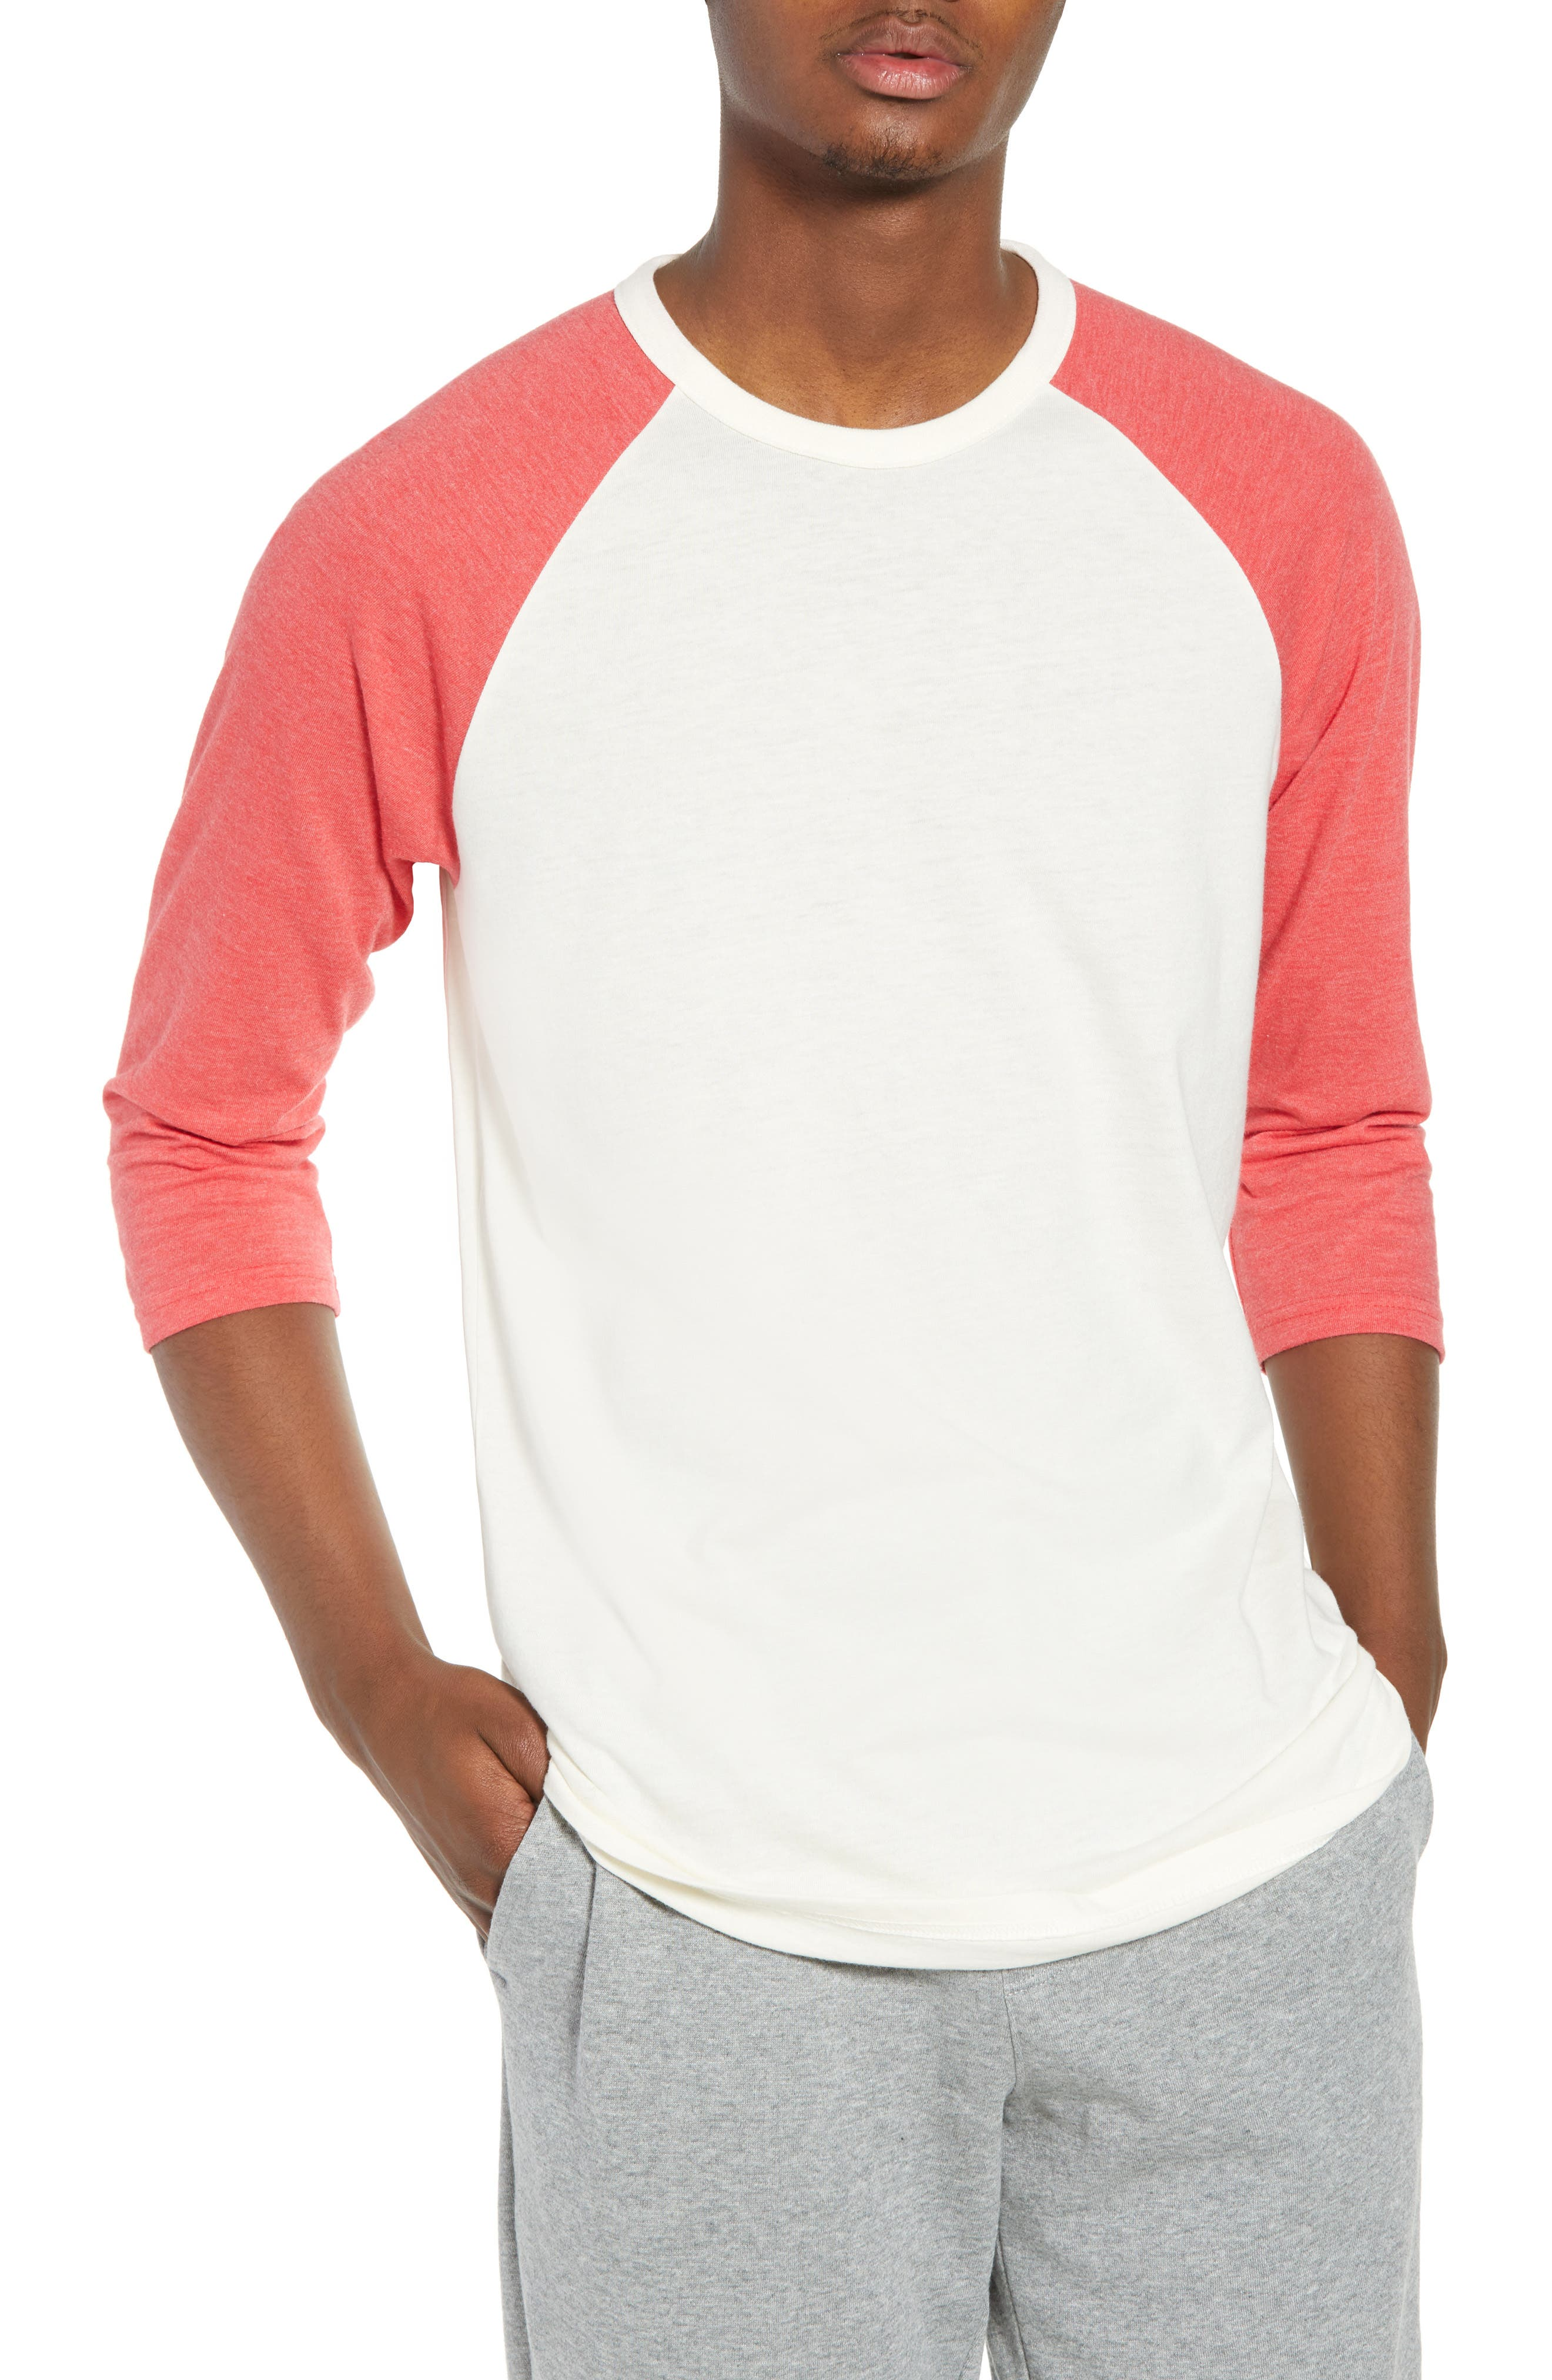 Baseball T-Shirt,                             Main thumbnail 1, color,                             IVORY EGRET-RED SAUCY